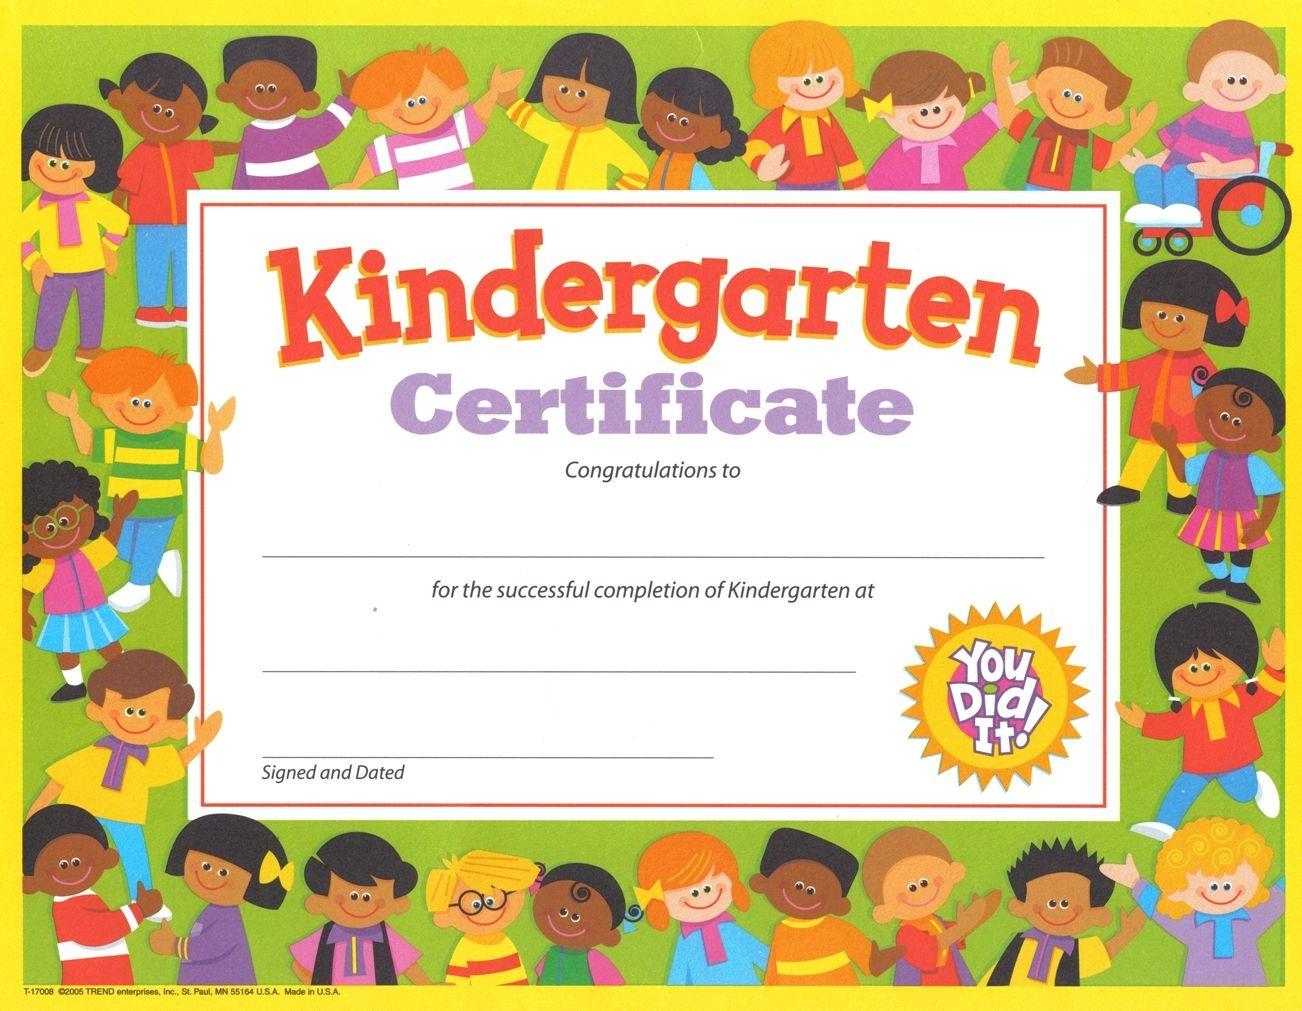 Free Printables For Graduation | Craft Ideas | Kindergarten - Free Printable Children's Certificates Templates